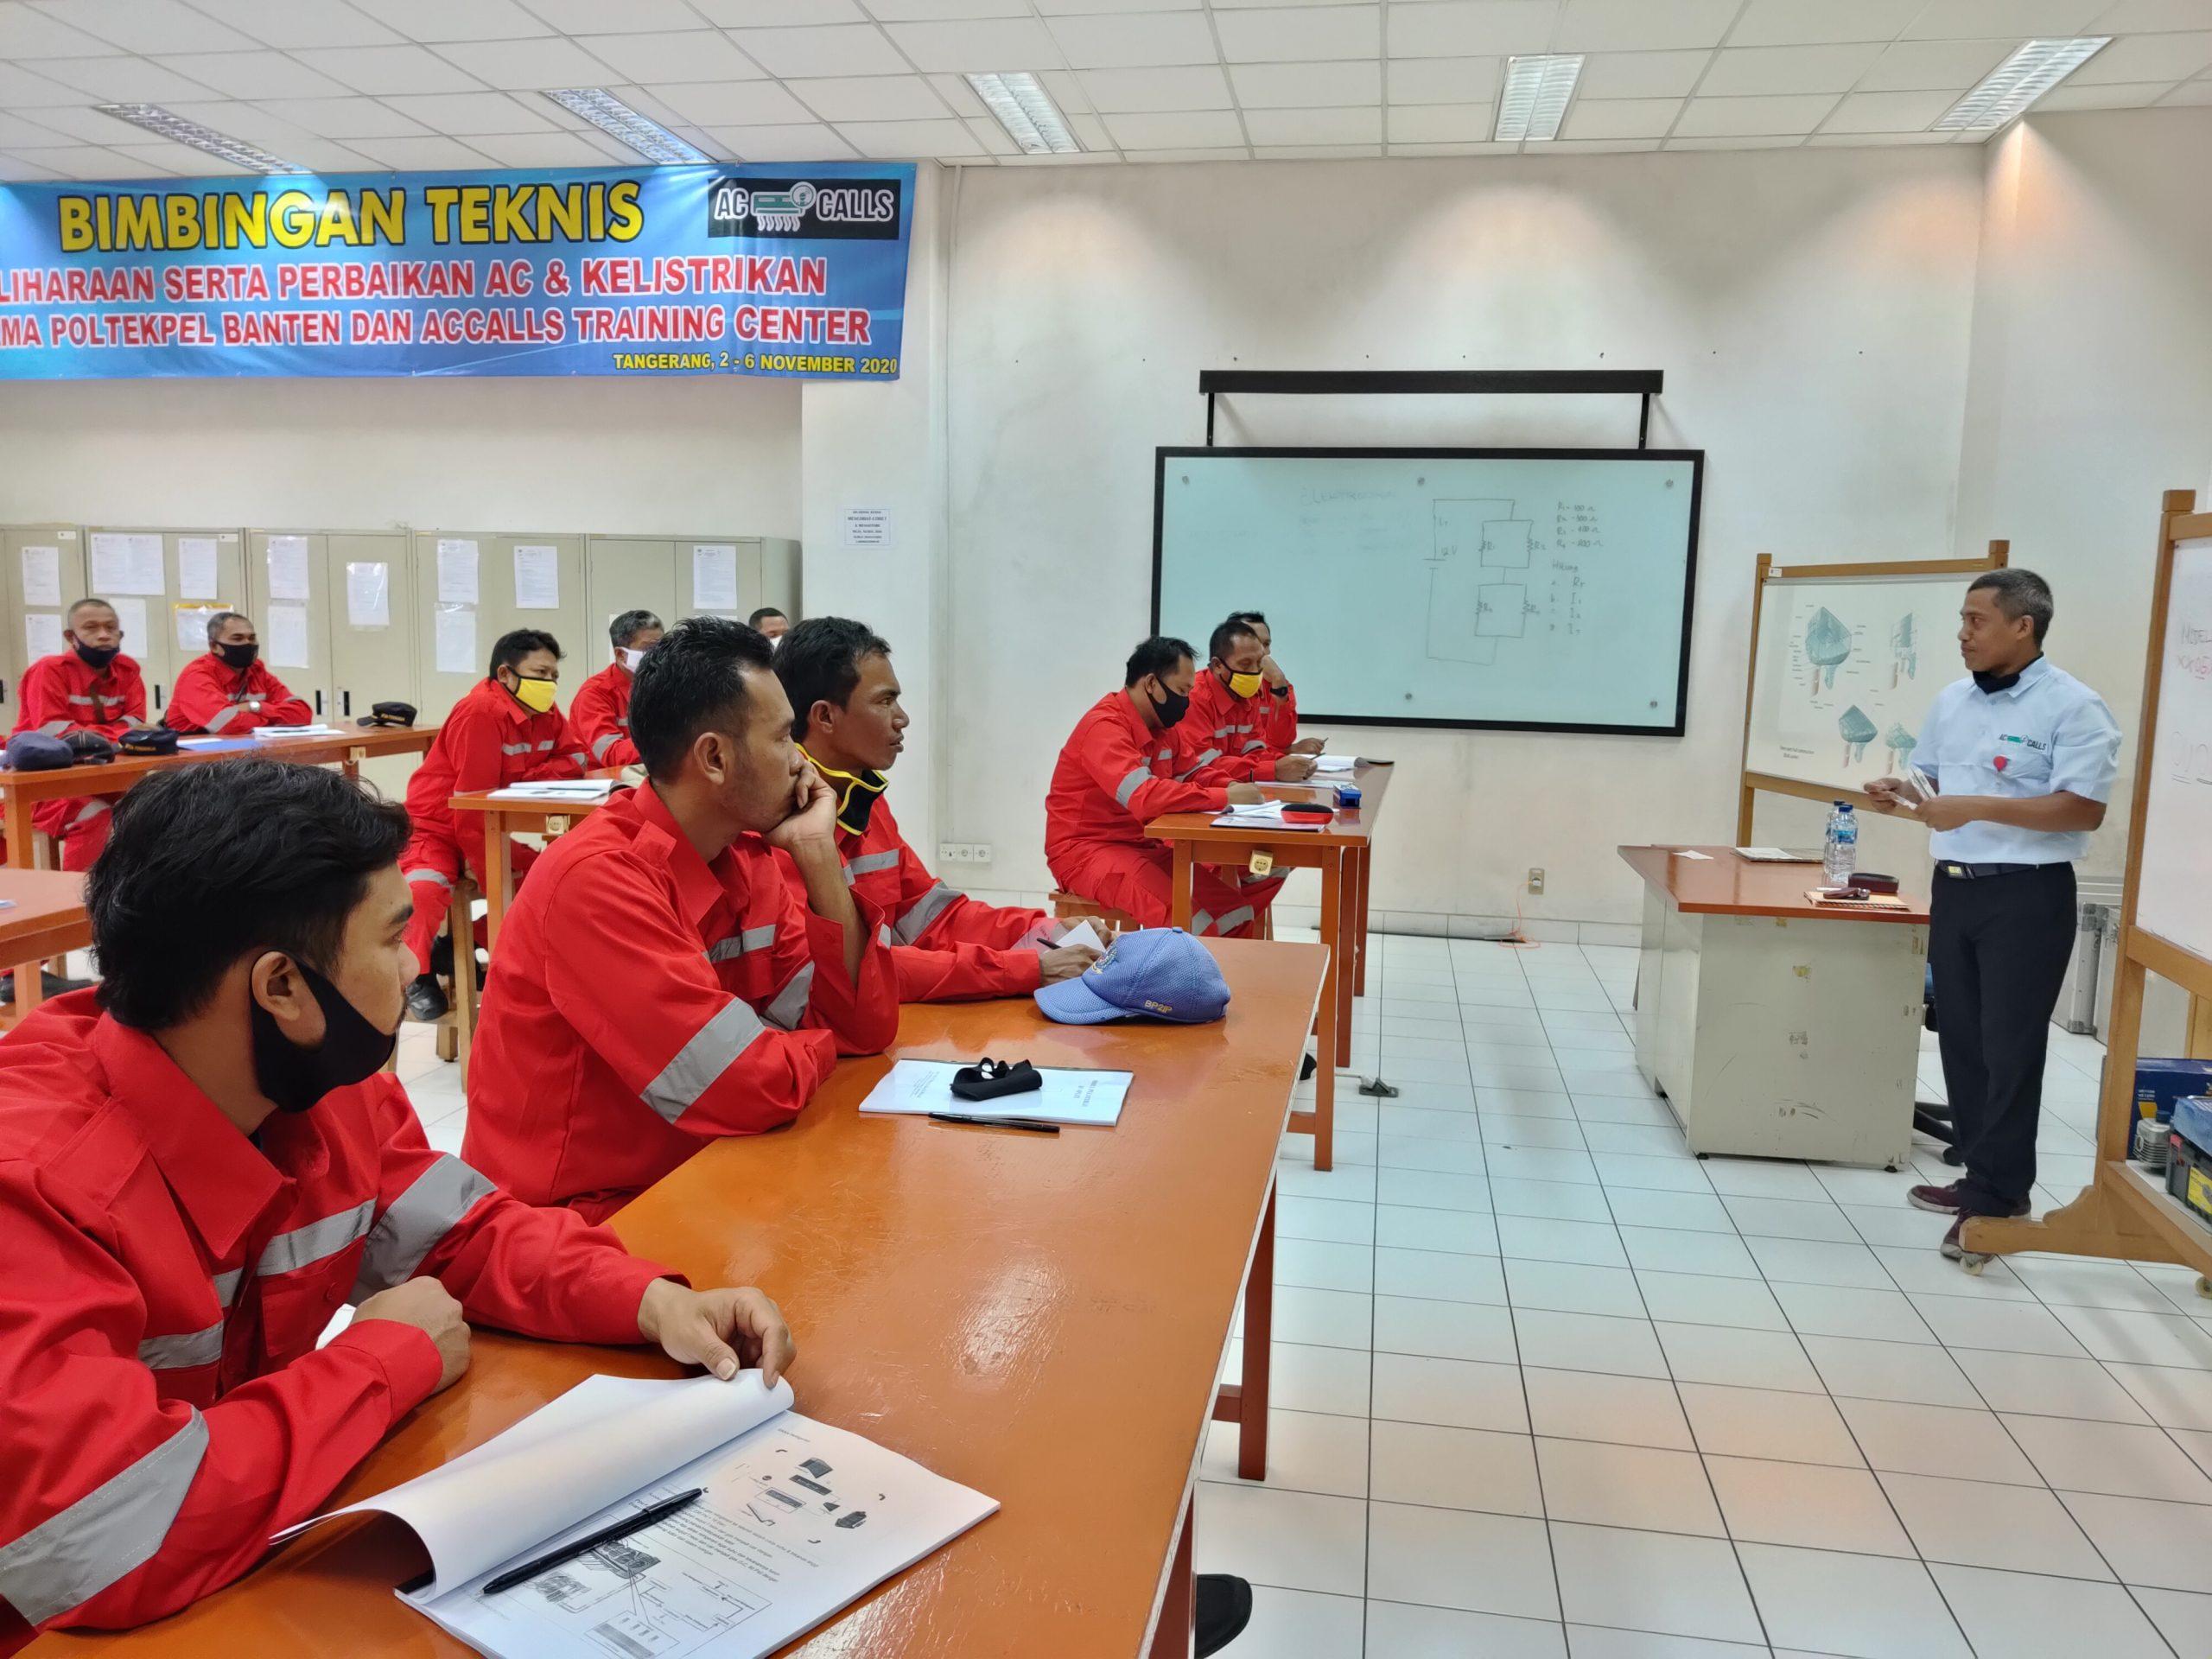 Bimbingan Teknis pemeliharaan dan perbaikan AC. Politeknik Pelayaran Banten 2020